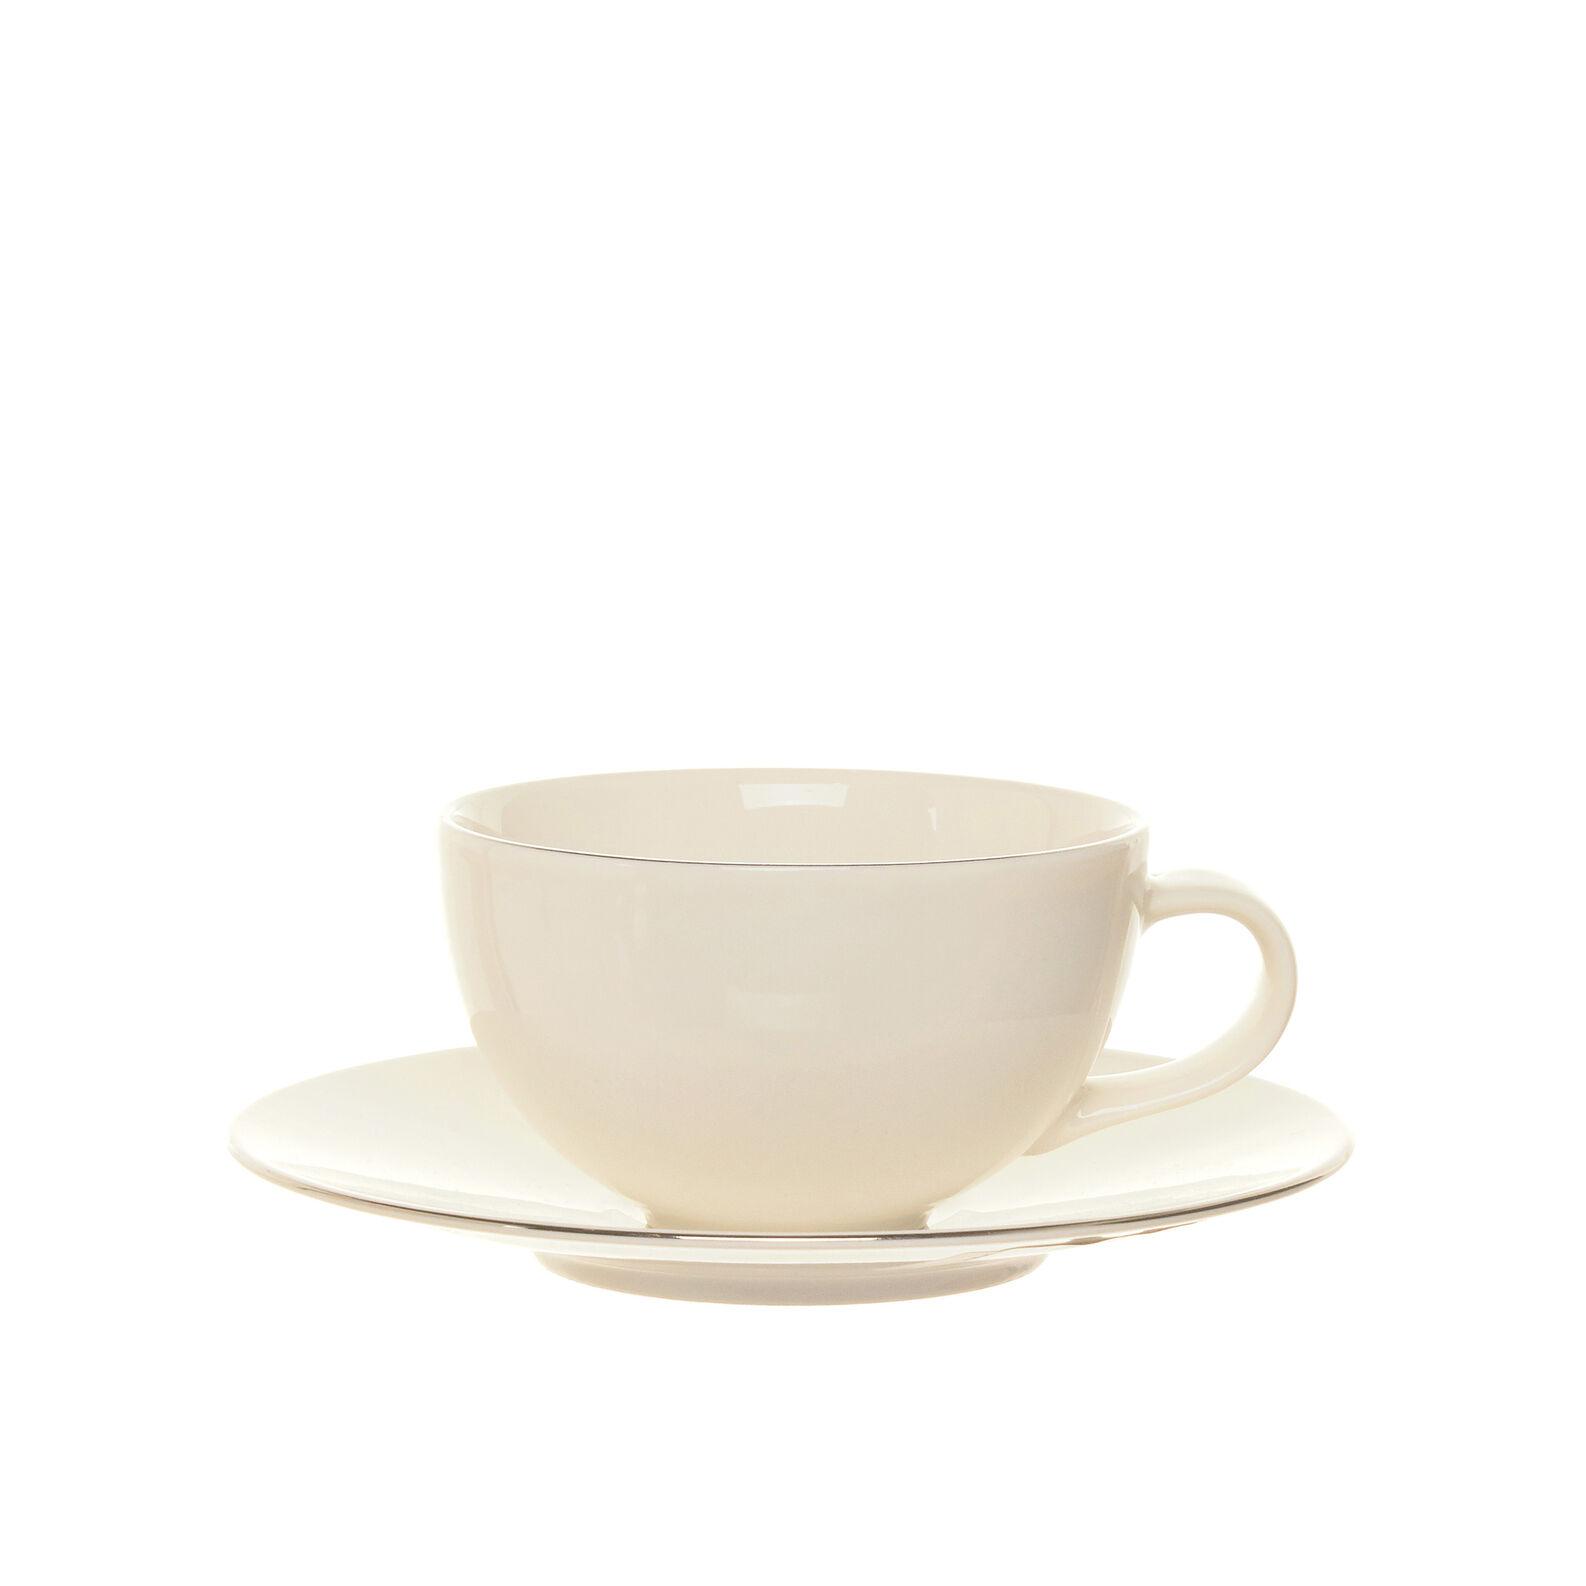 Roma new bone china tea cup